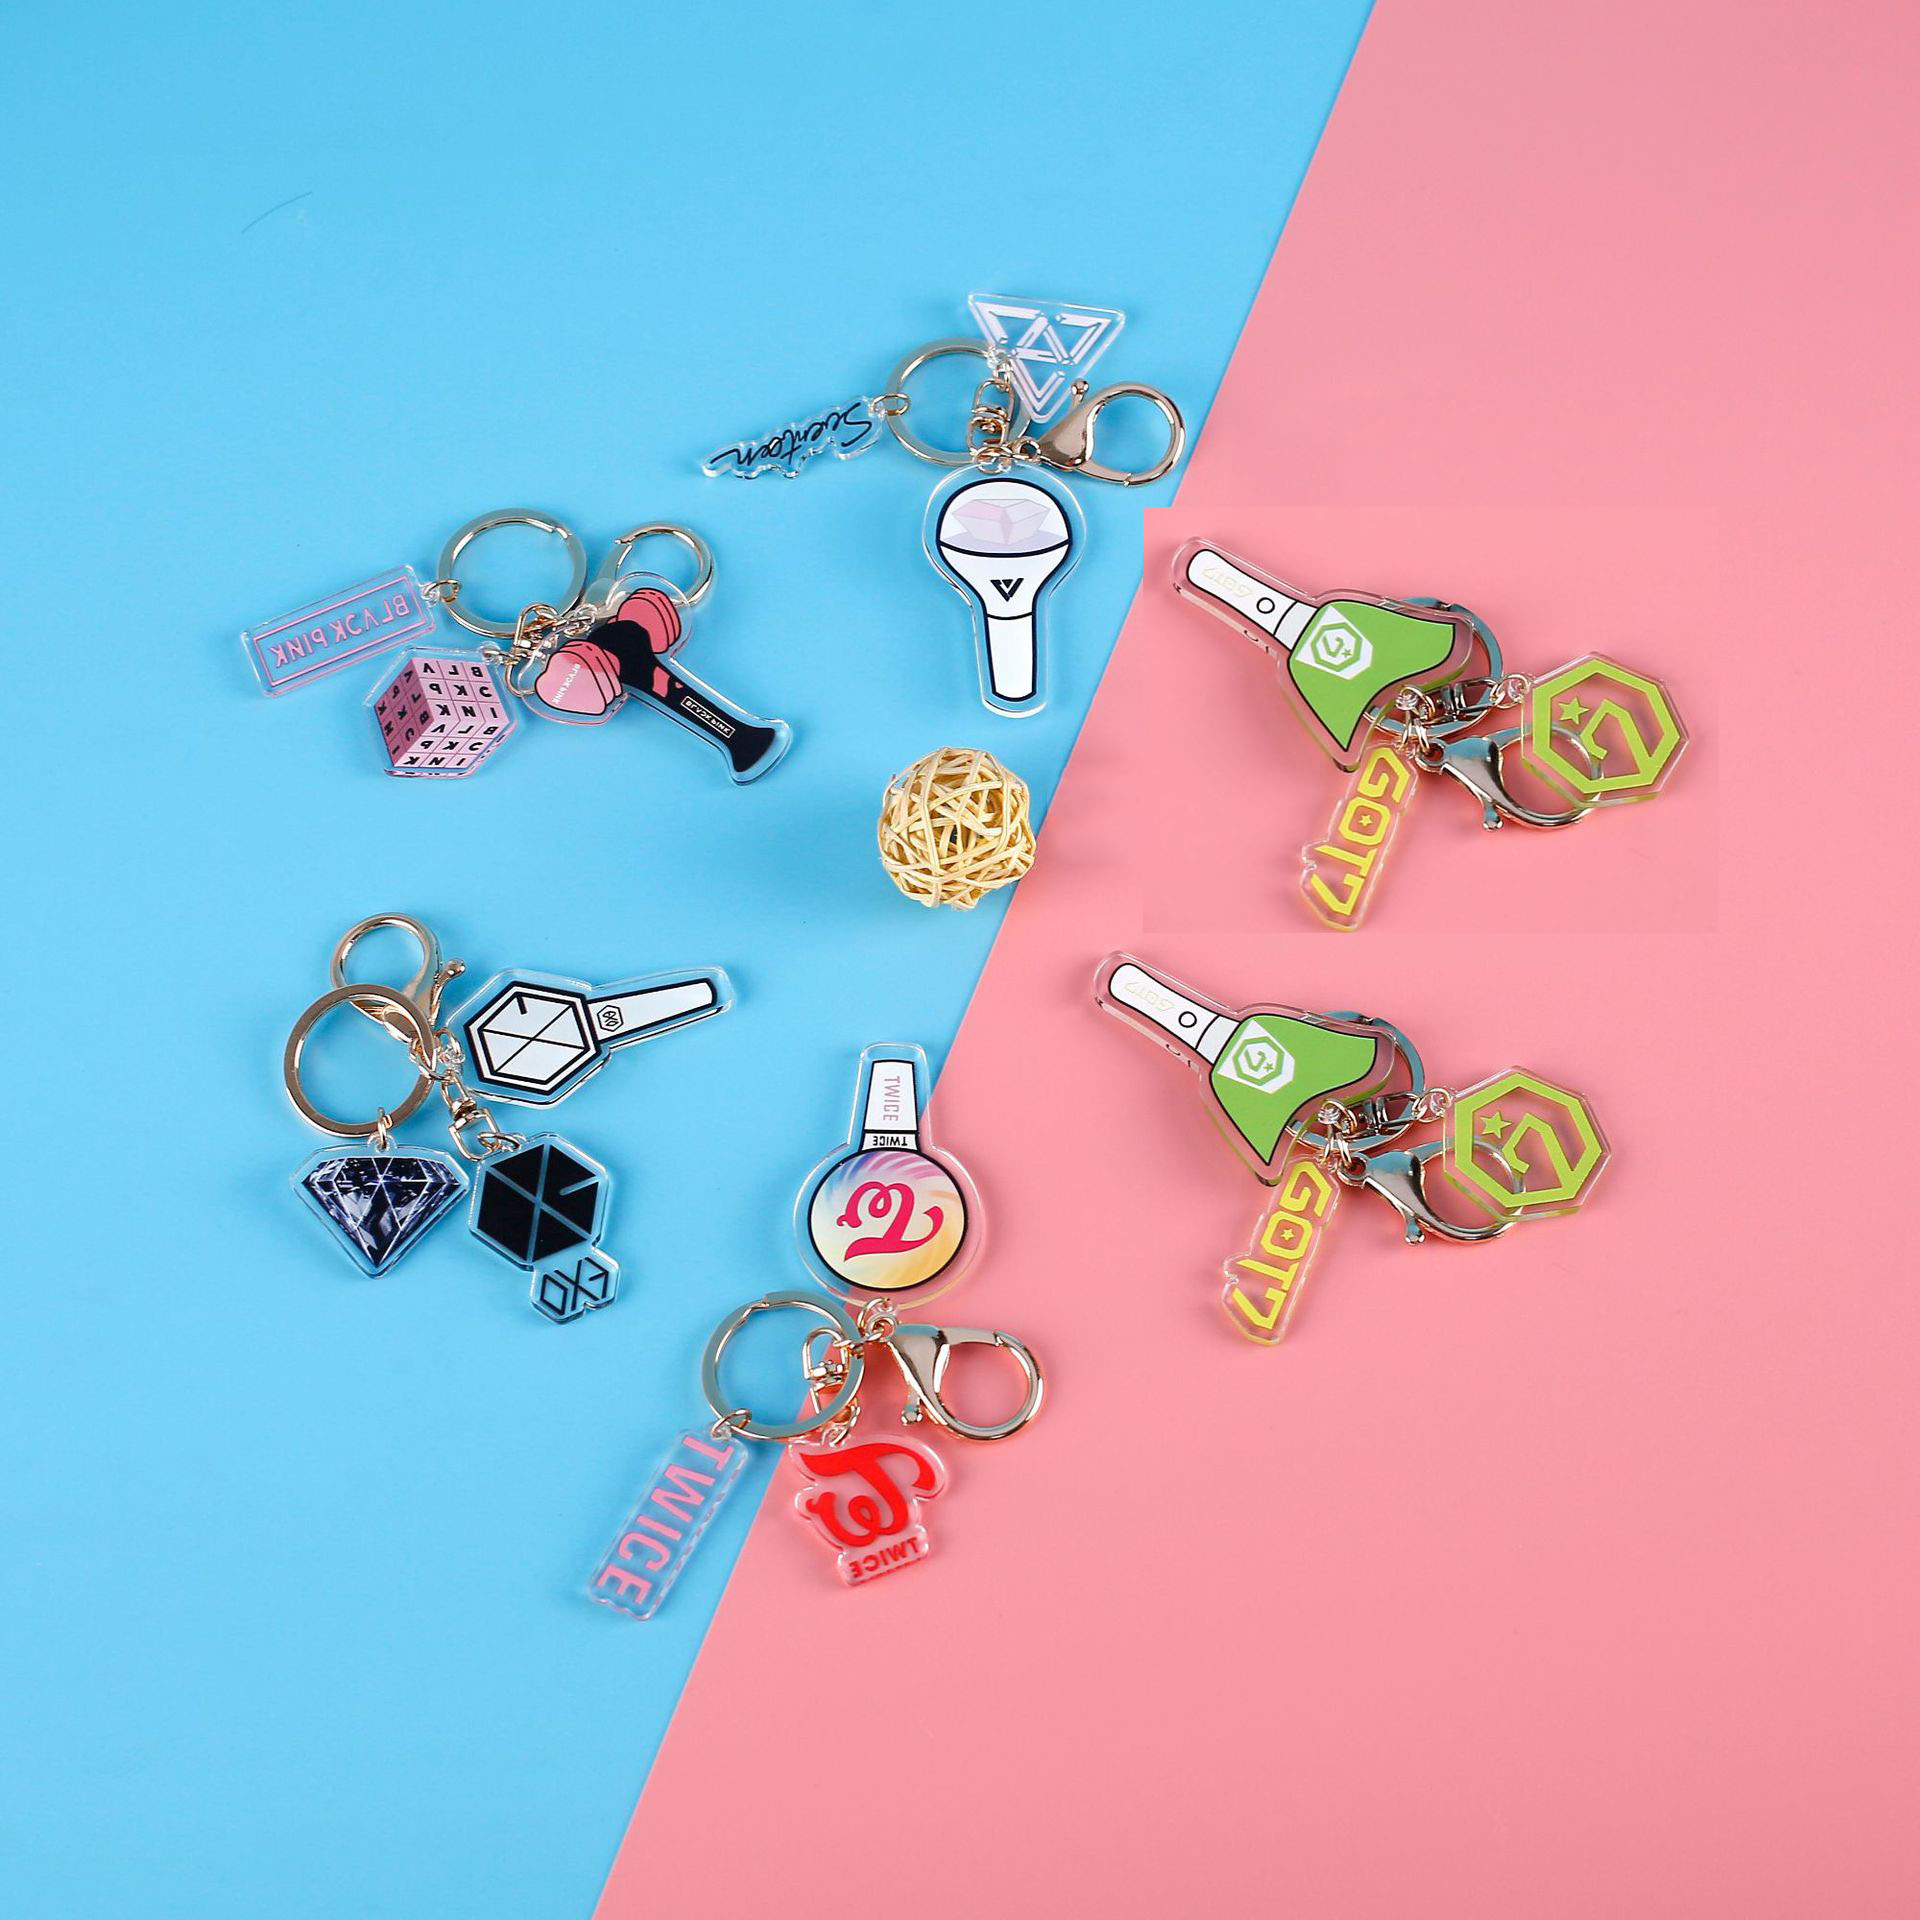 Kpop Korean Band Blackpink Exo Twice Acrylic Pendent Key Ring